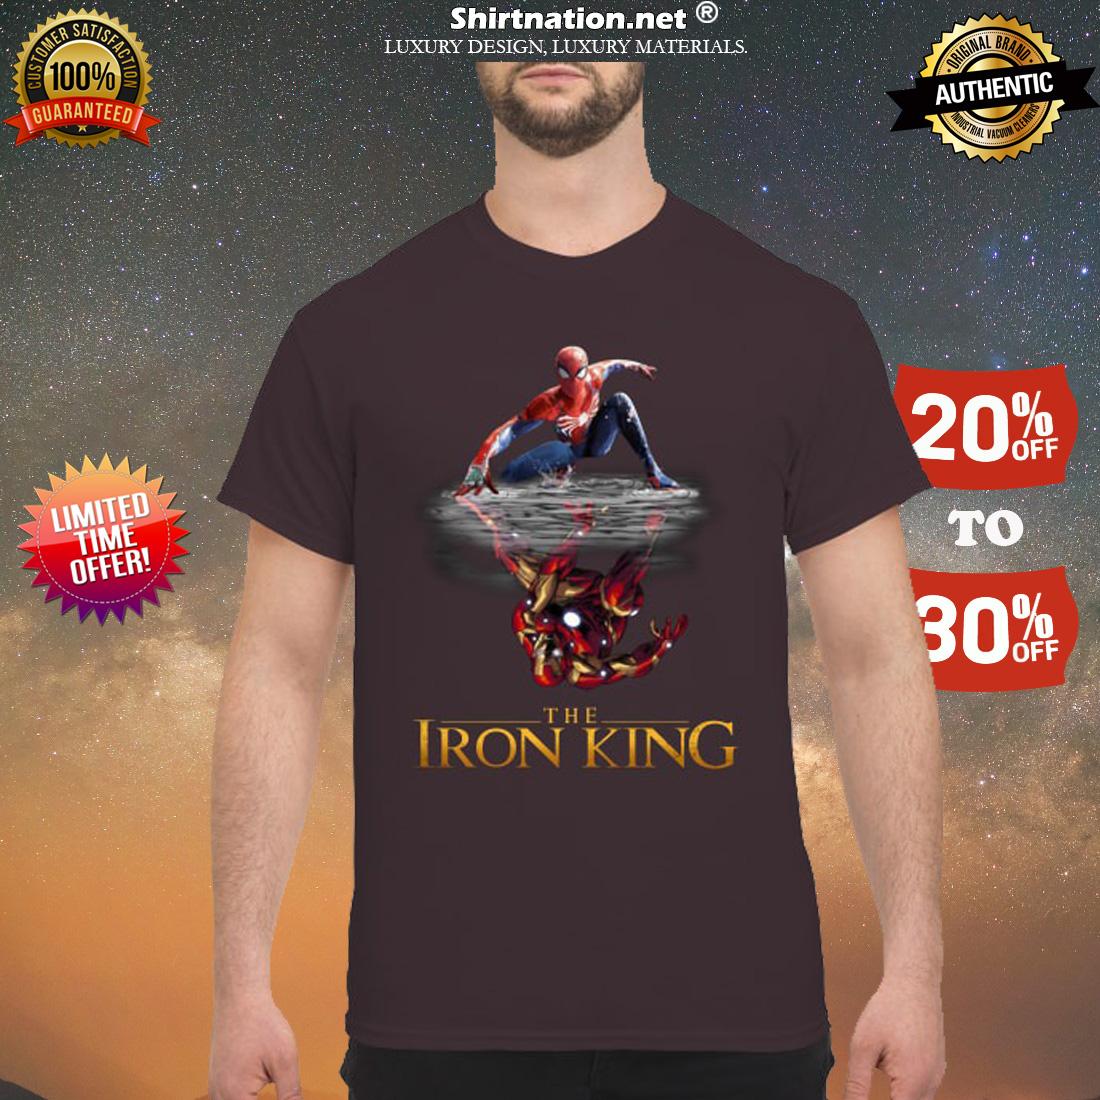 The Iron King shirt